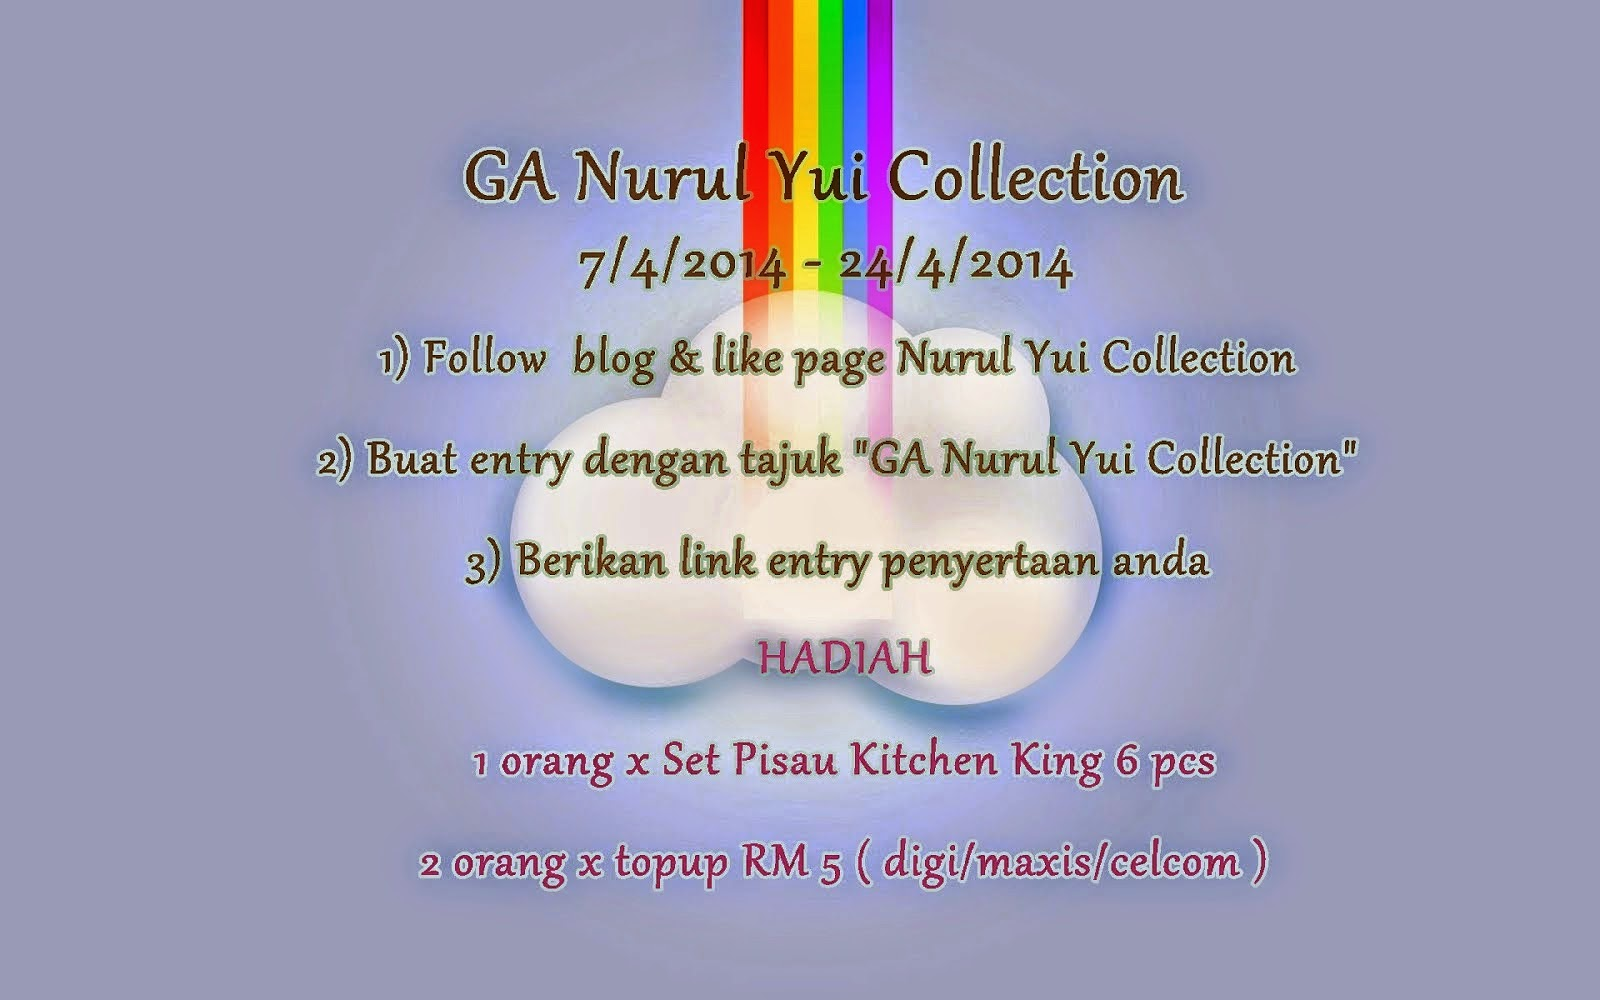 http://nusha1706.blogspot.com/2014/04/ga-nurul-yui-collection.html